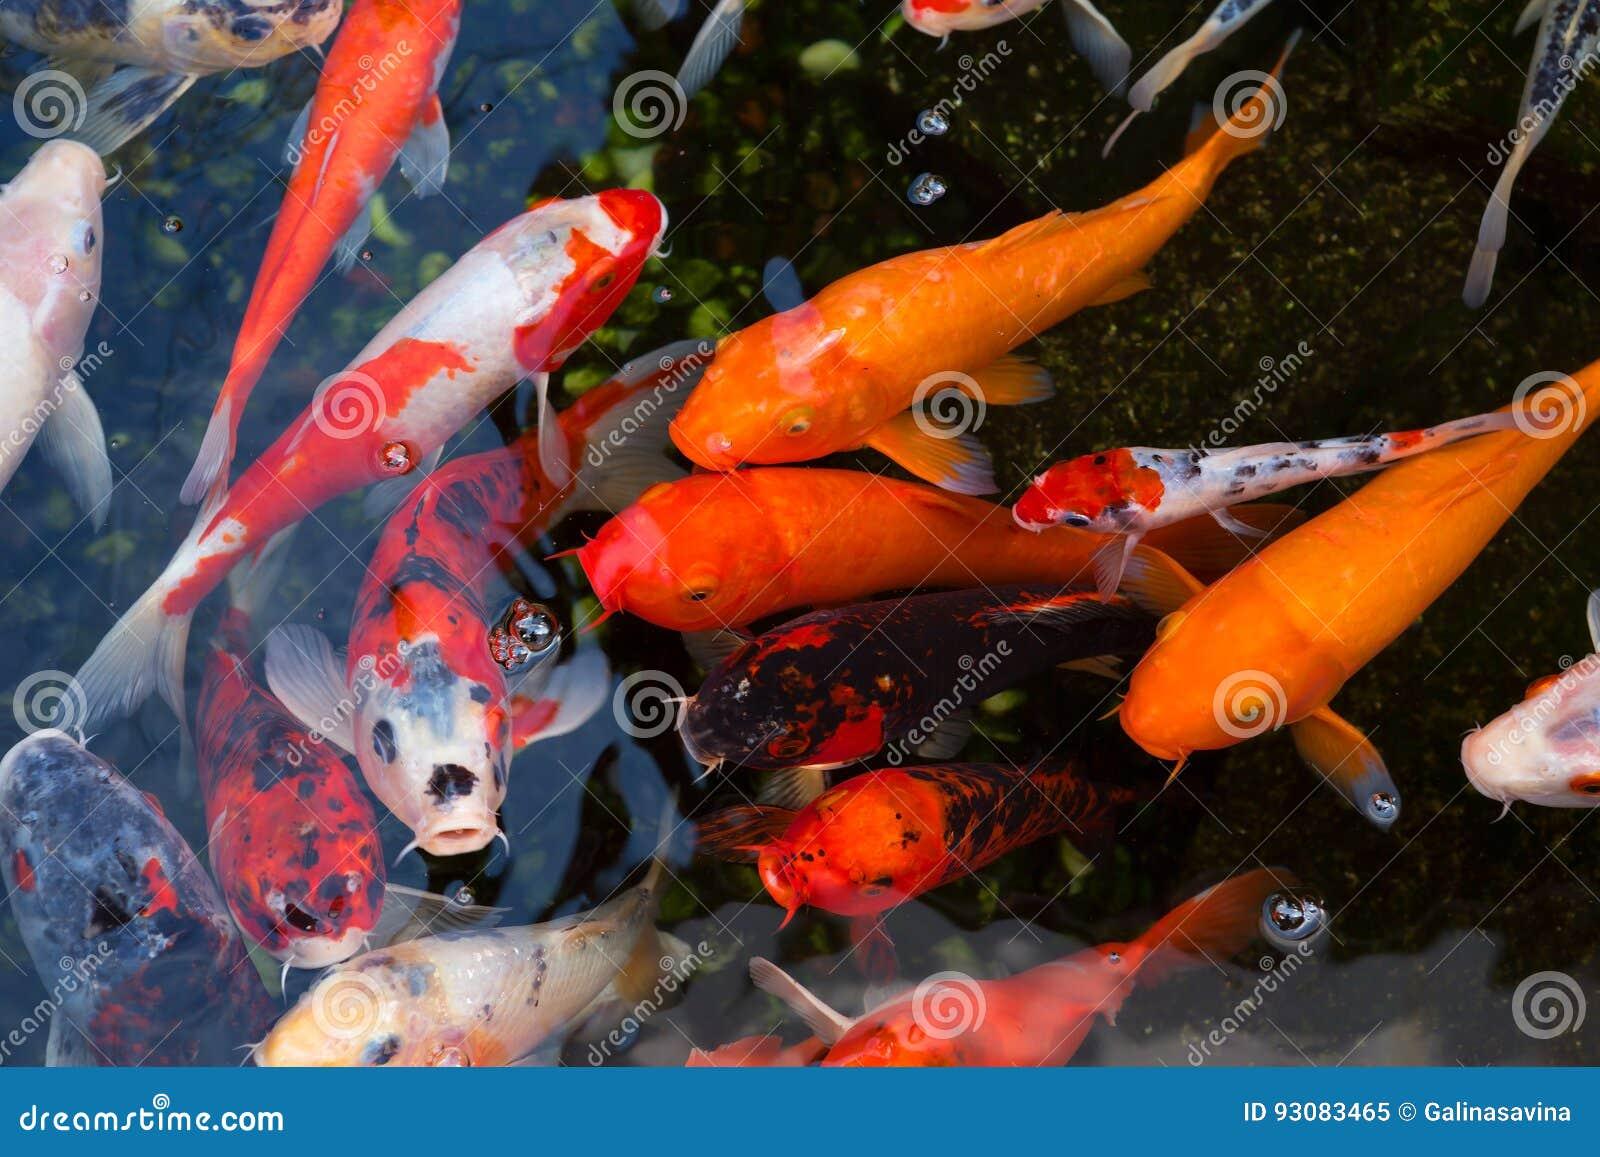 Japanese koi carp stock image. Image of japan, multicolor - 93083465